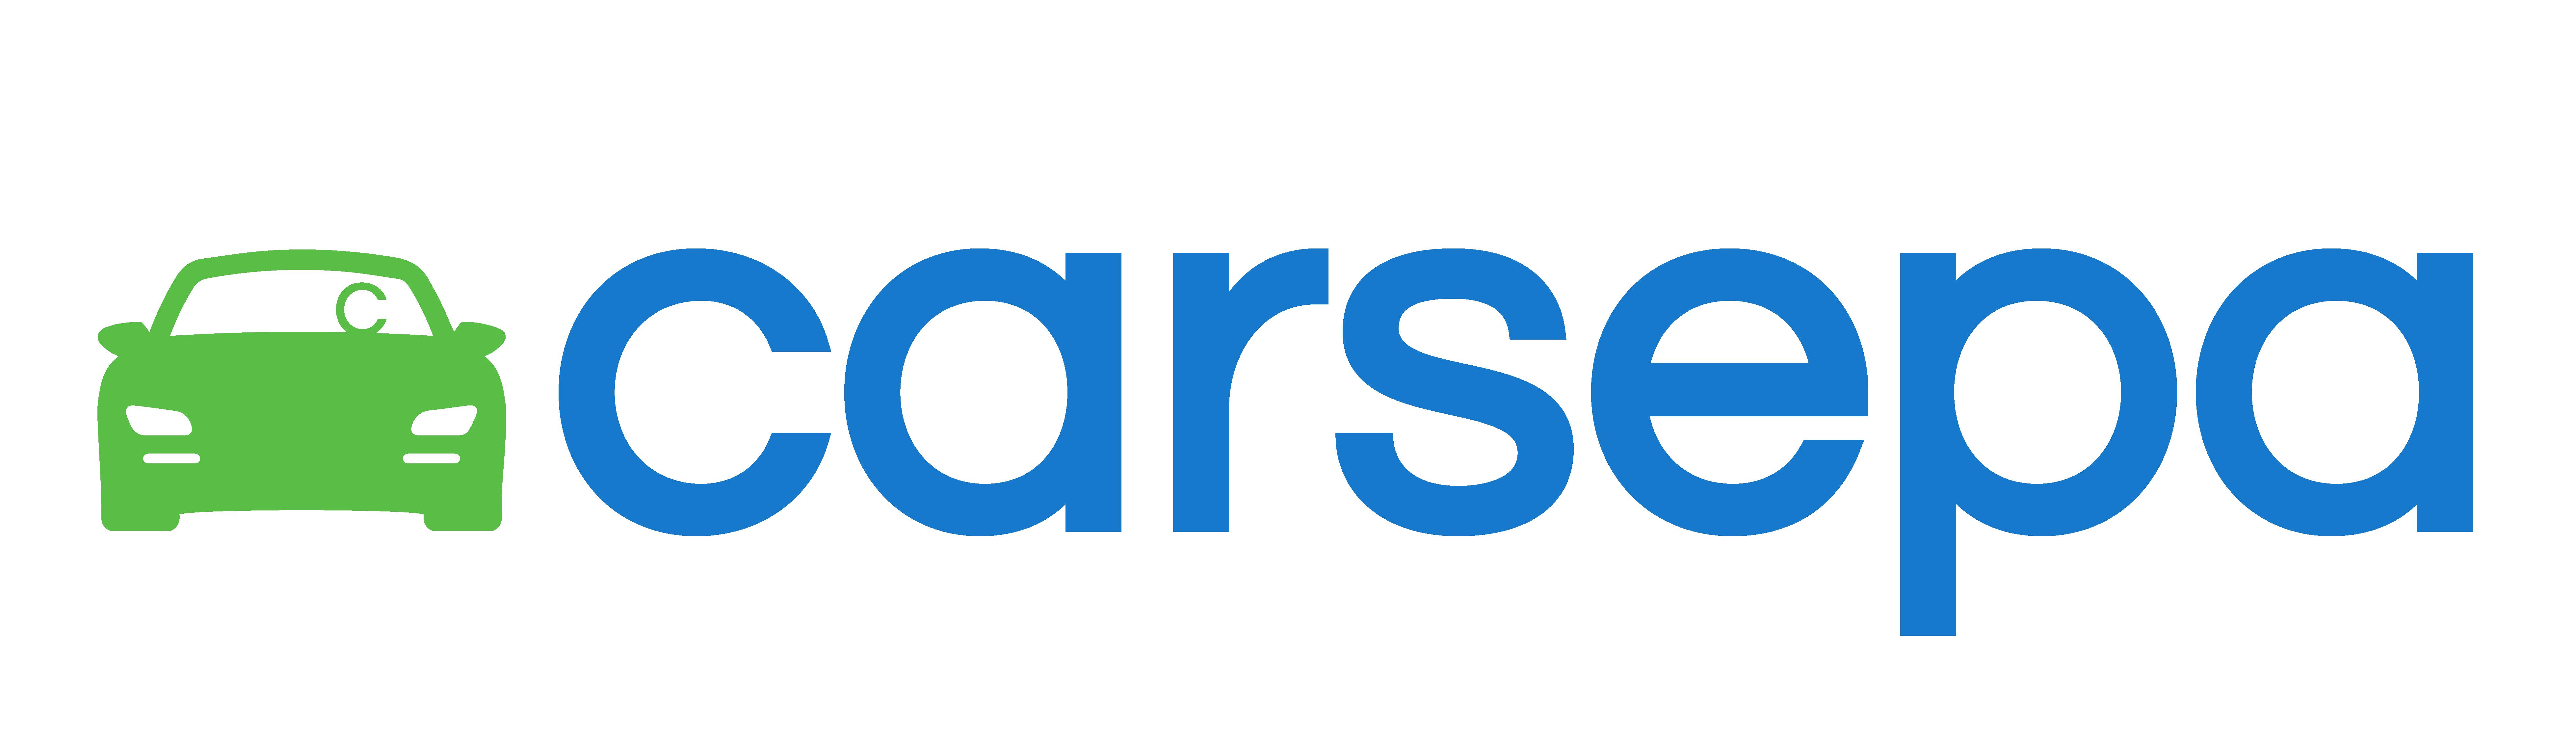 Carsepa